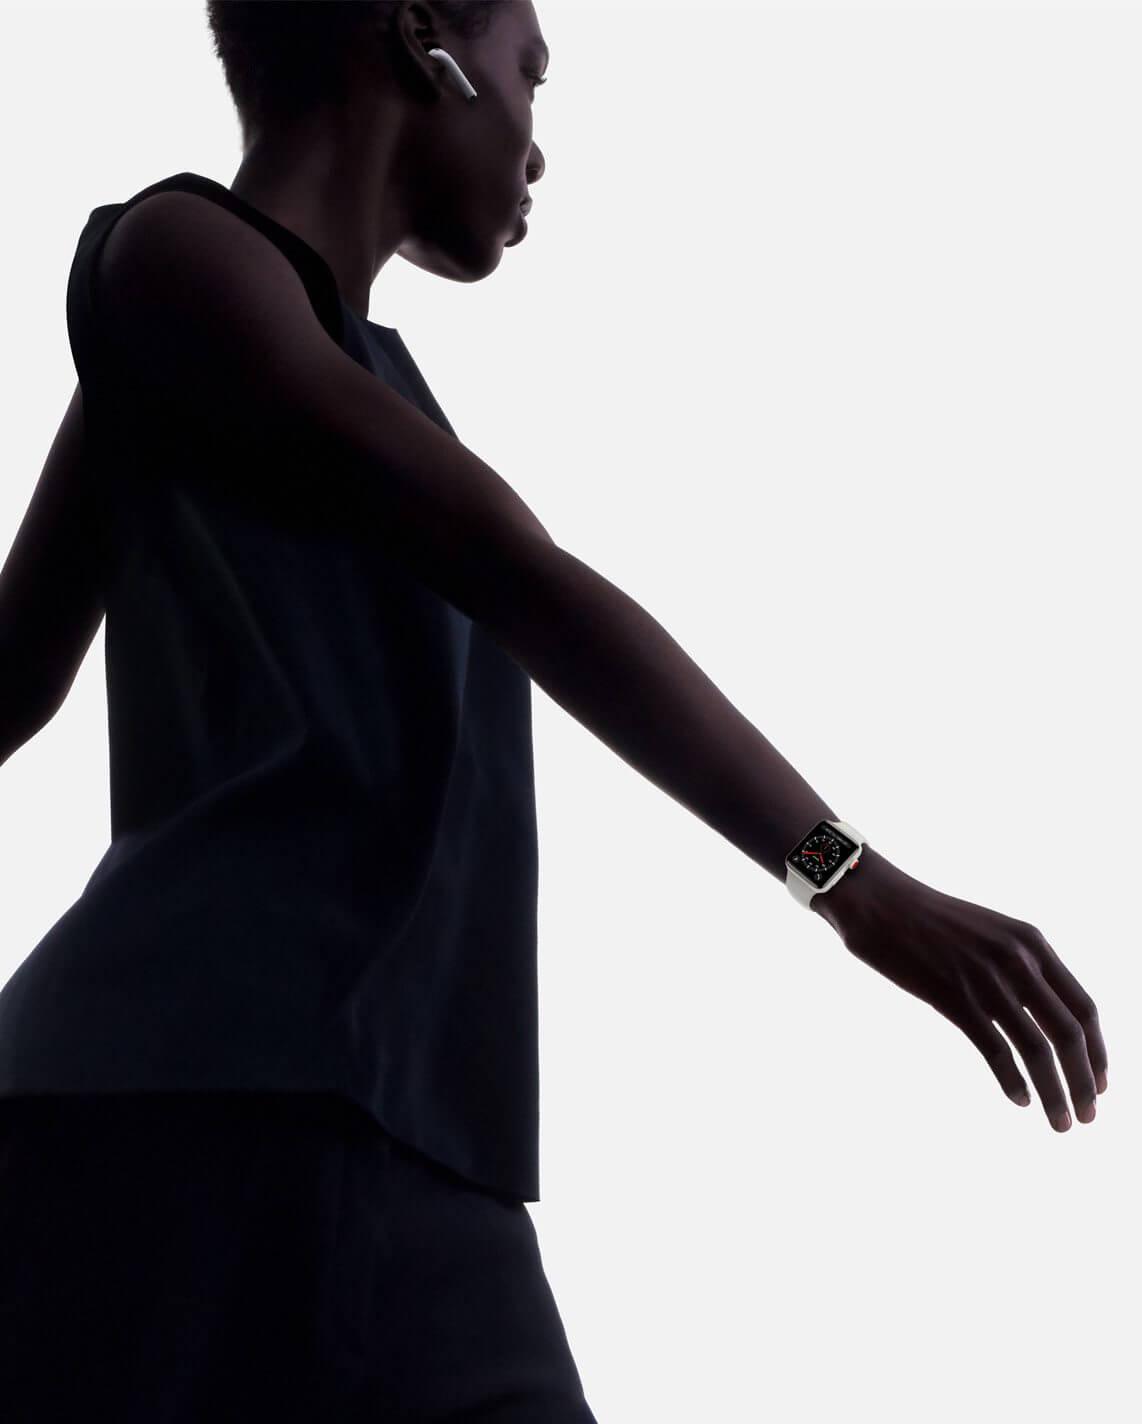 watch series 3 walking wristshot - REVIEW: Apple Watch Series 3, o wearable do momento